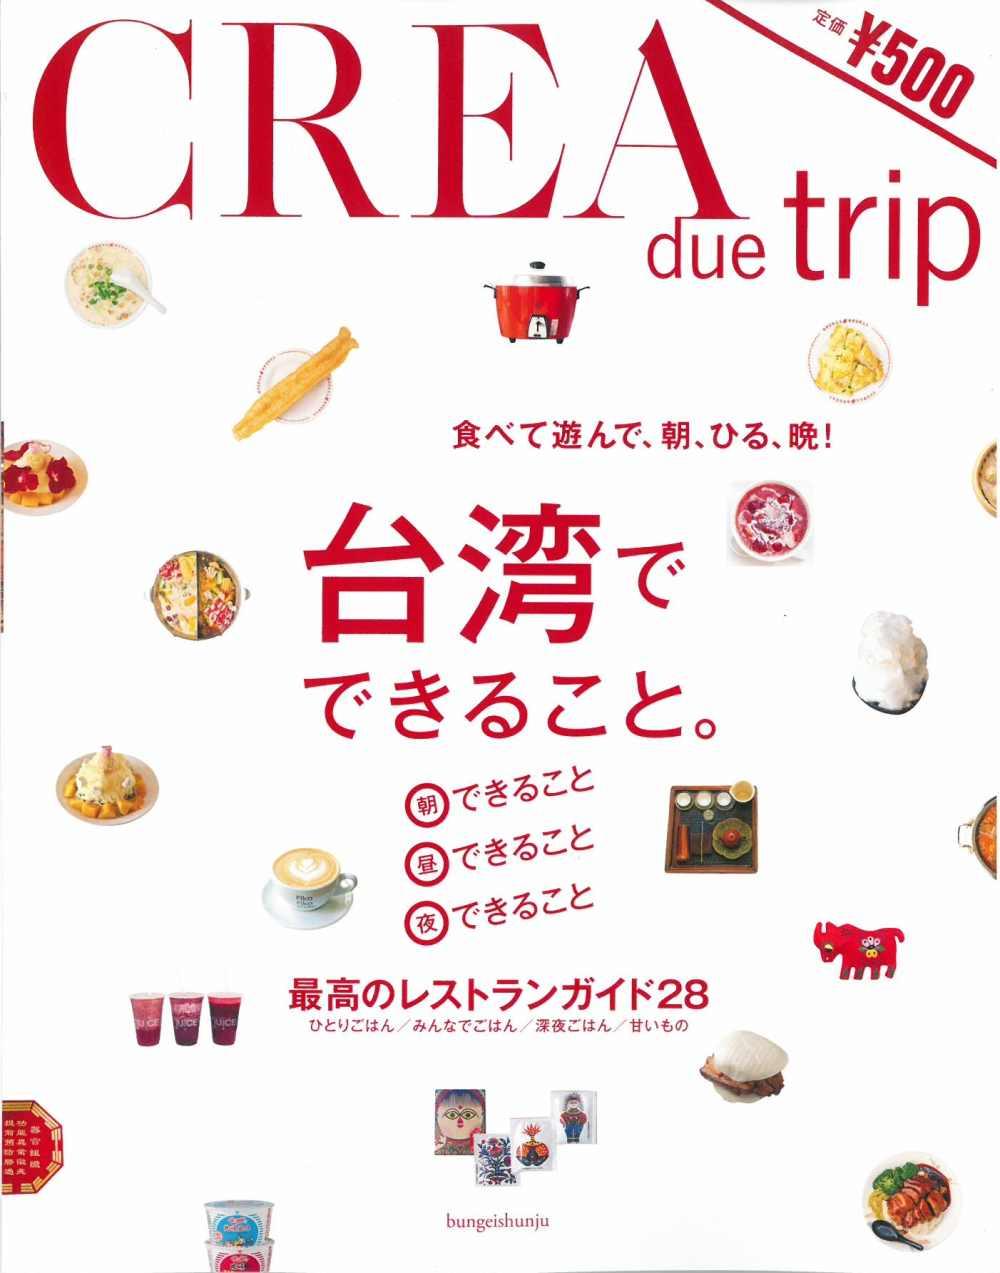 CREA due trip旅遊情報手冊: